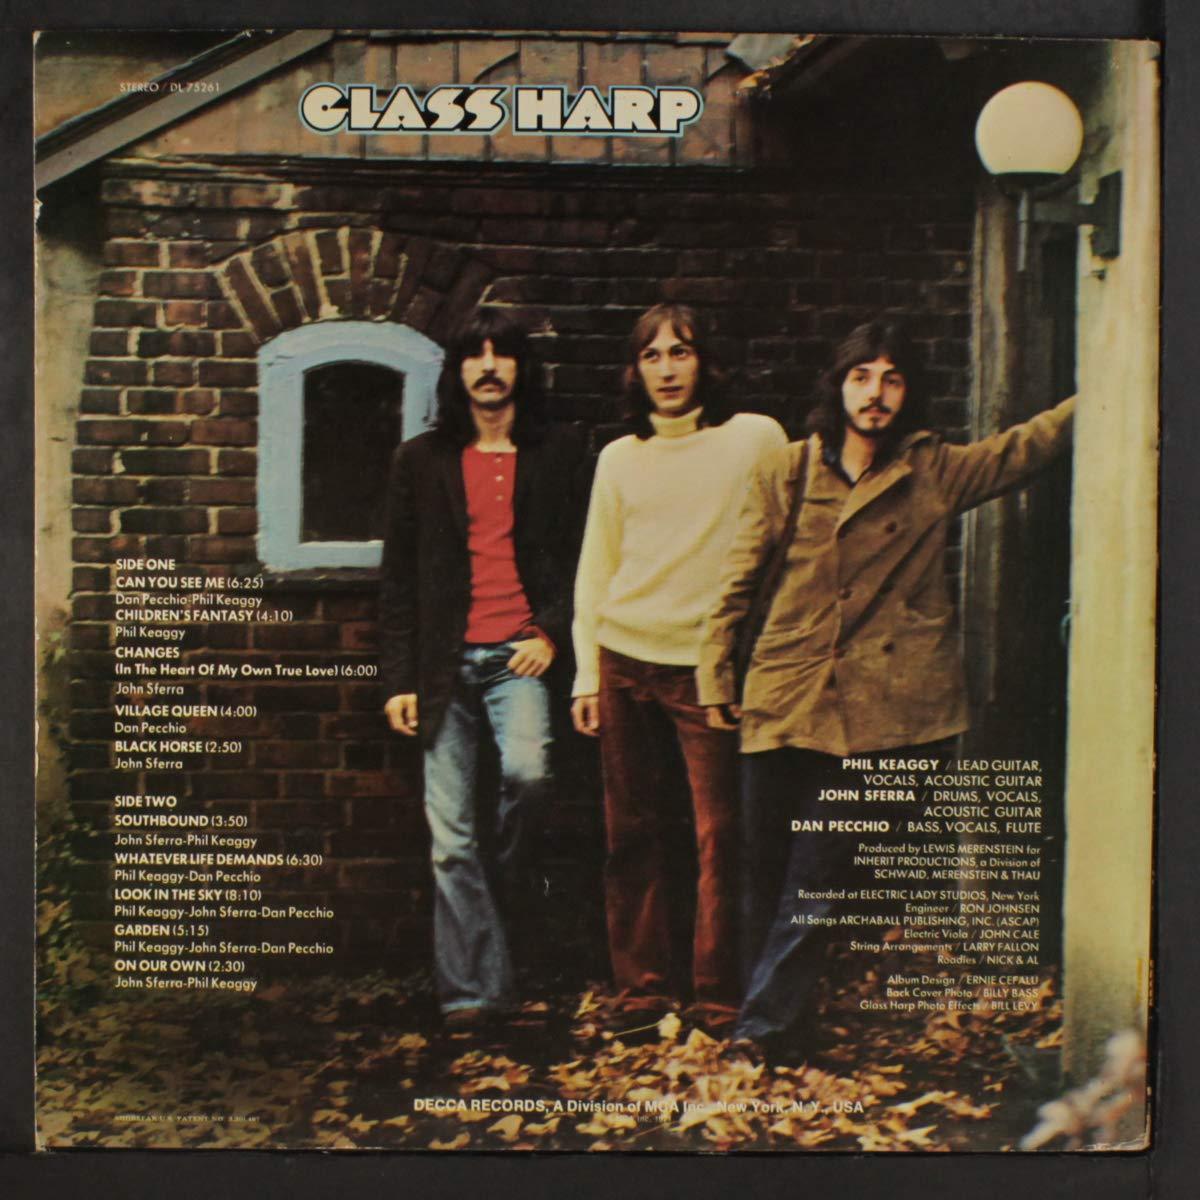 glass harp: GLASS HARP: Amazon.es: Música